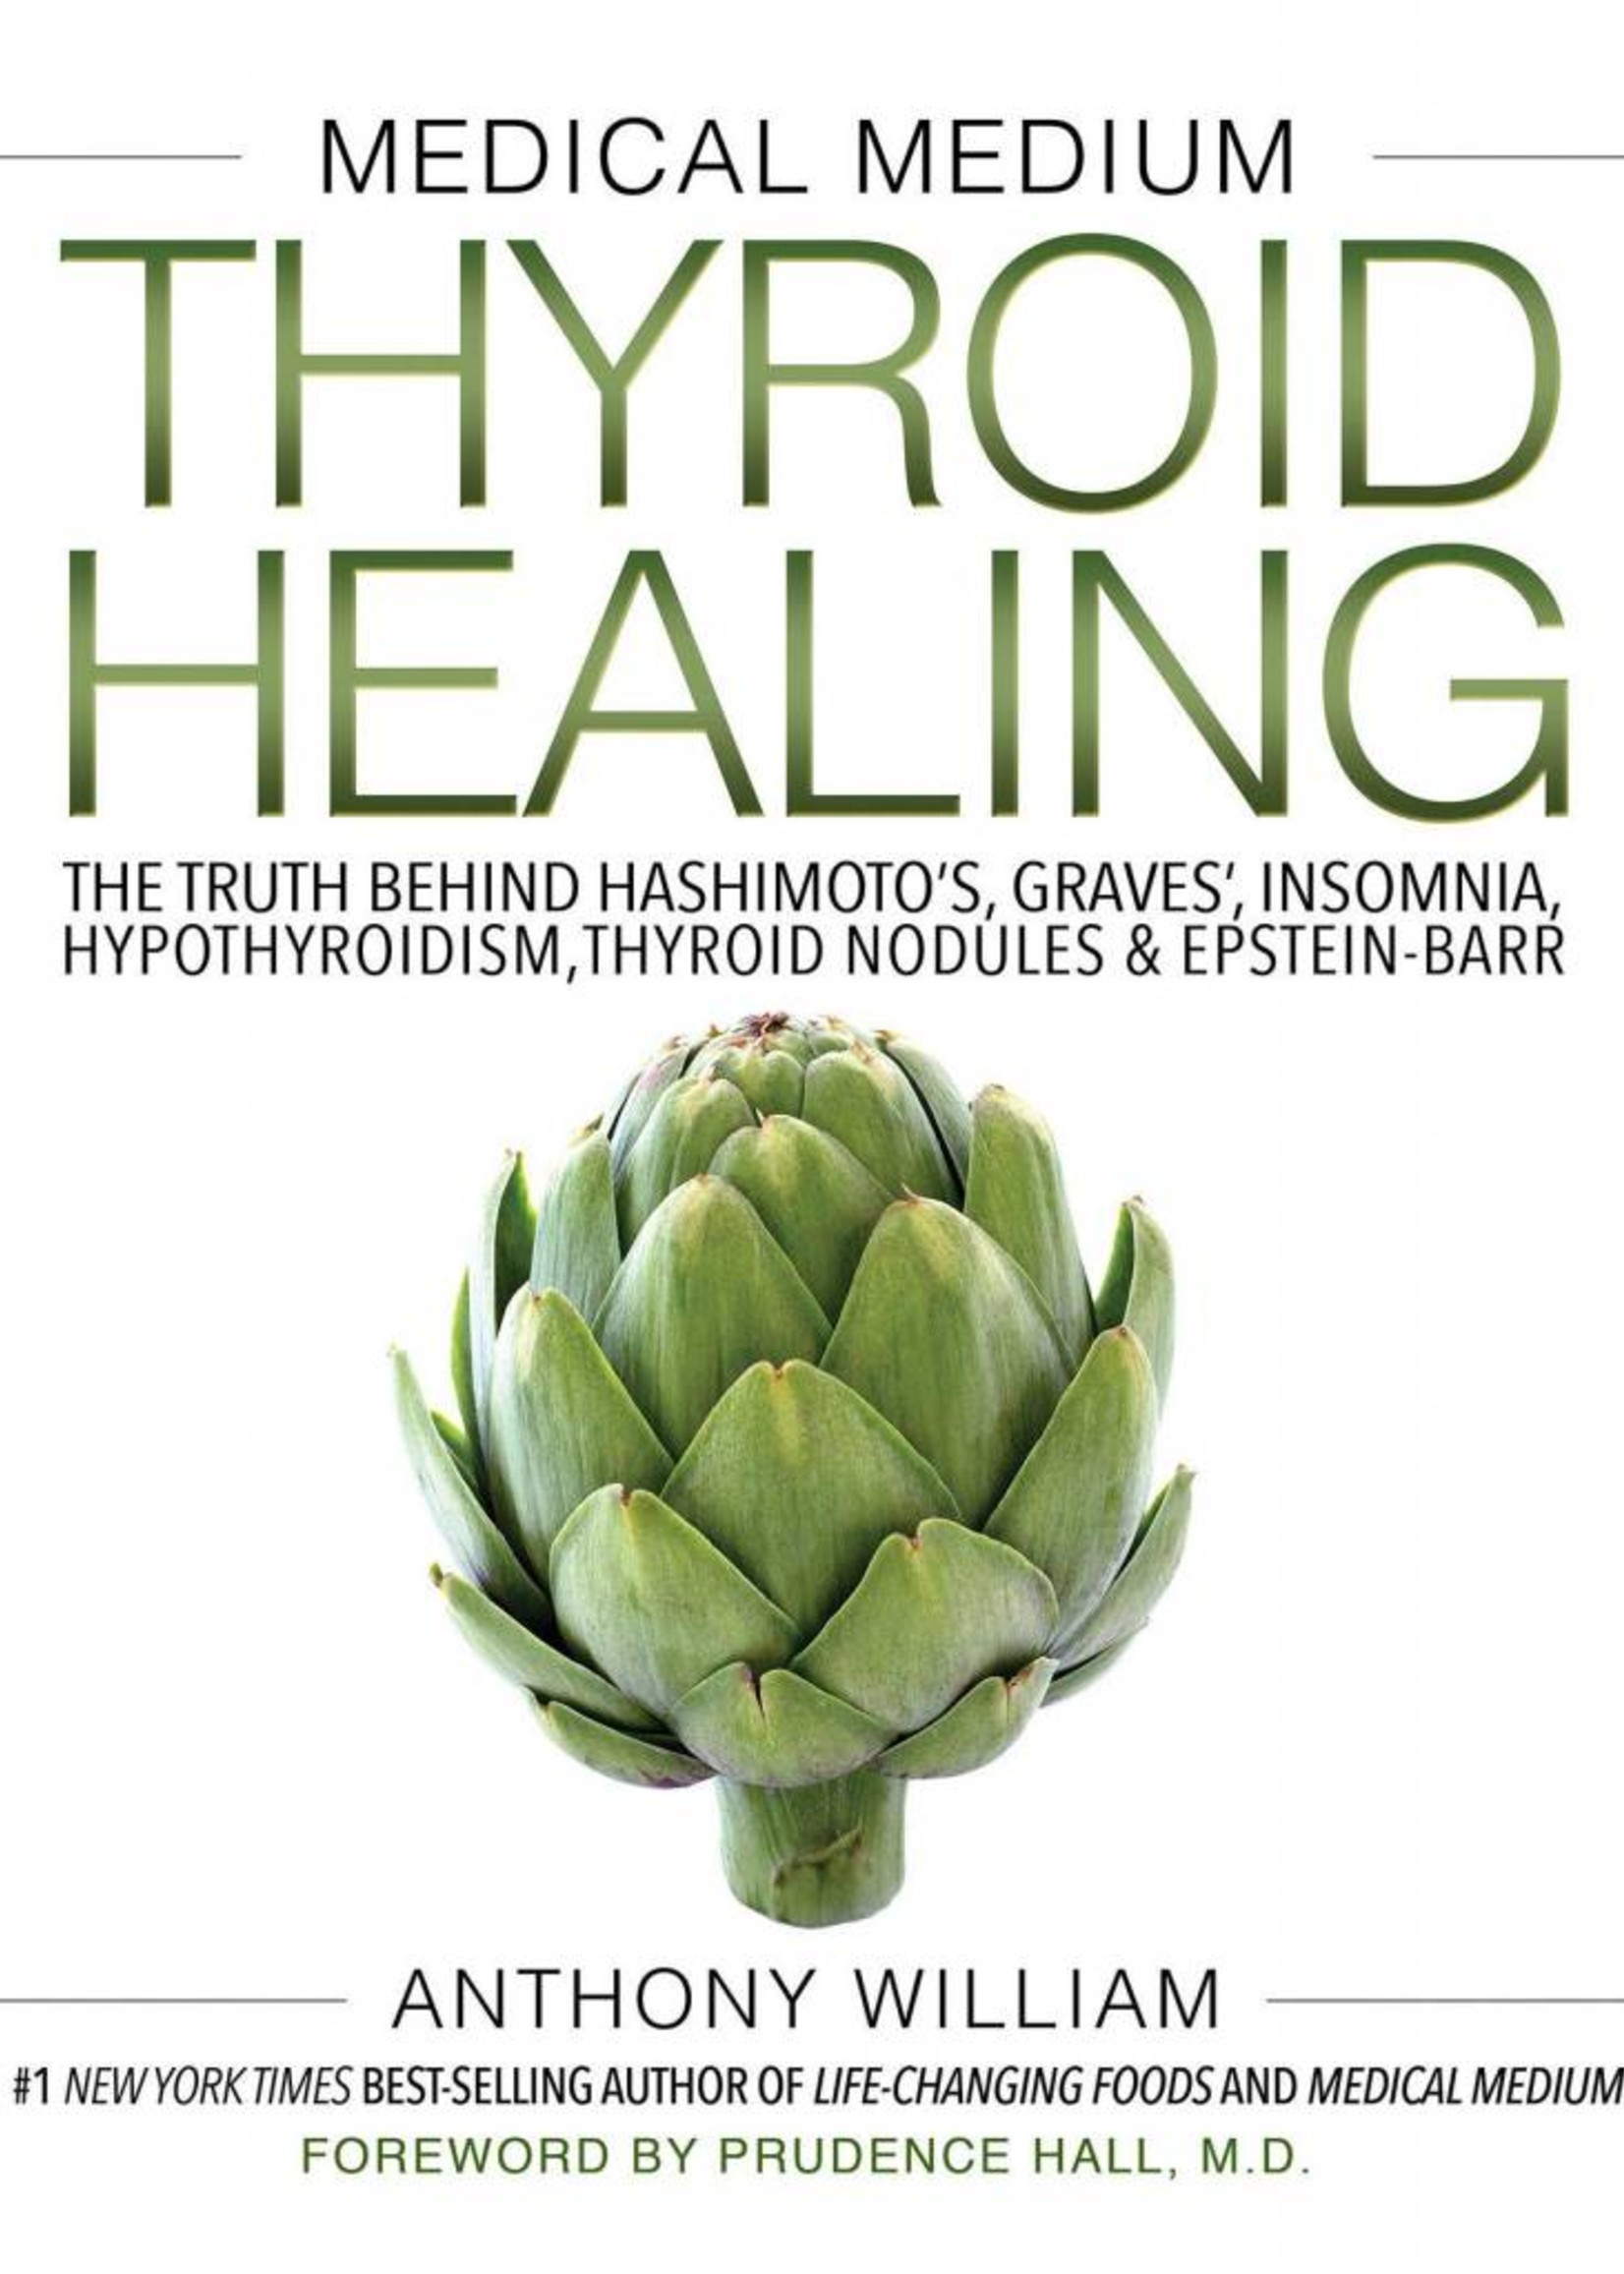 Medical Medium Thyroid Healing | The Truth behind Hashimoto's, Graves', Insomnia, Hypothyroidism, Thyroid Nodules & Epstein-Barr